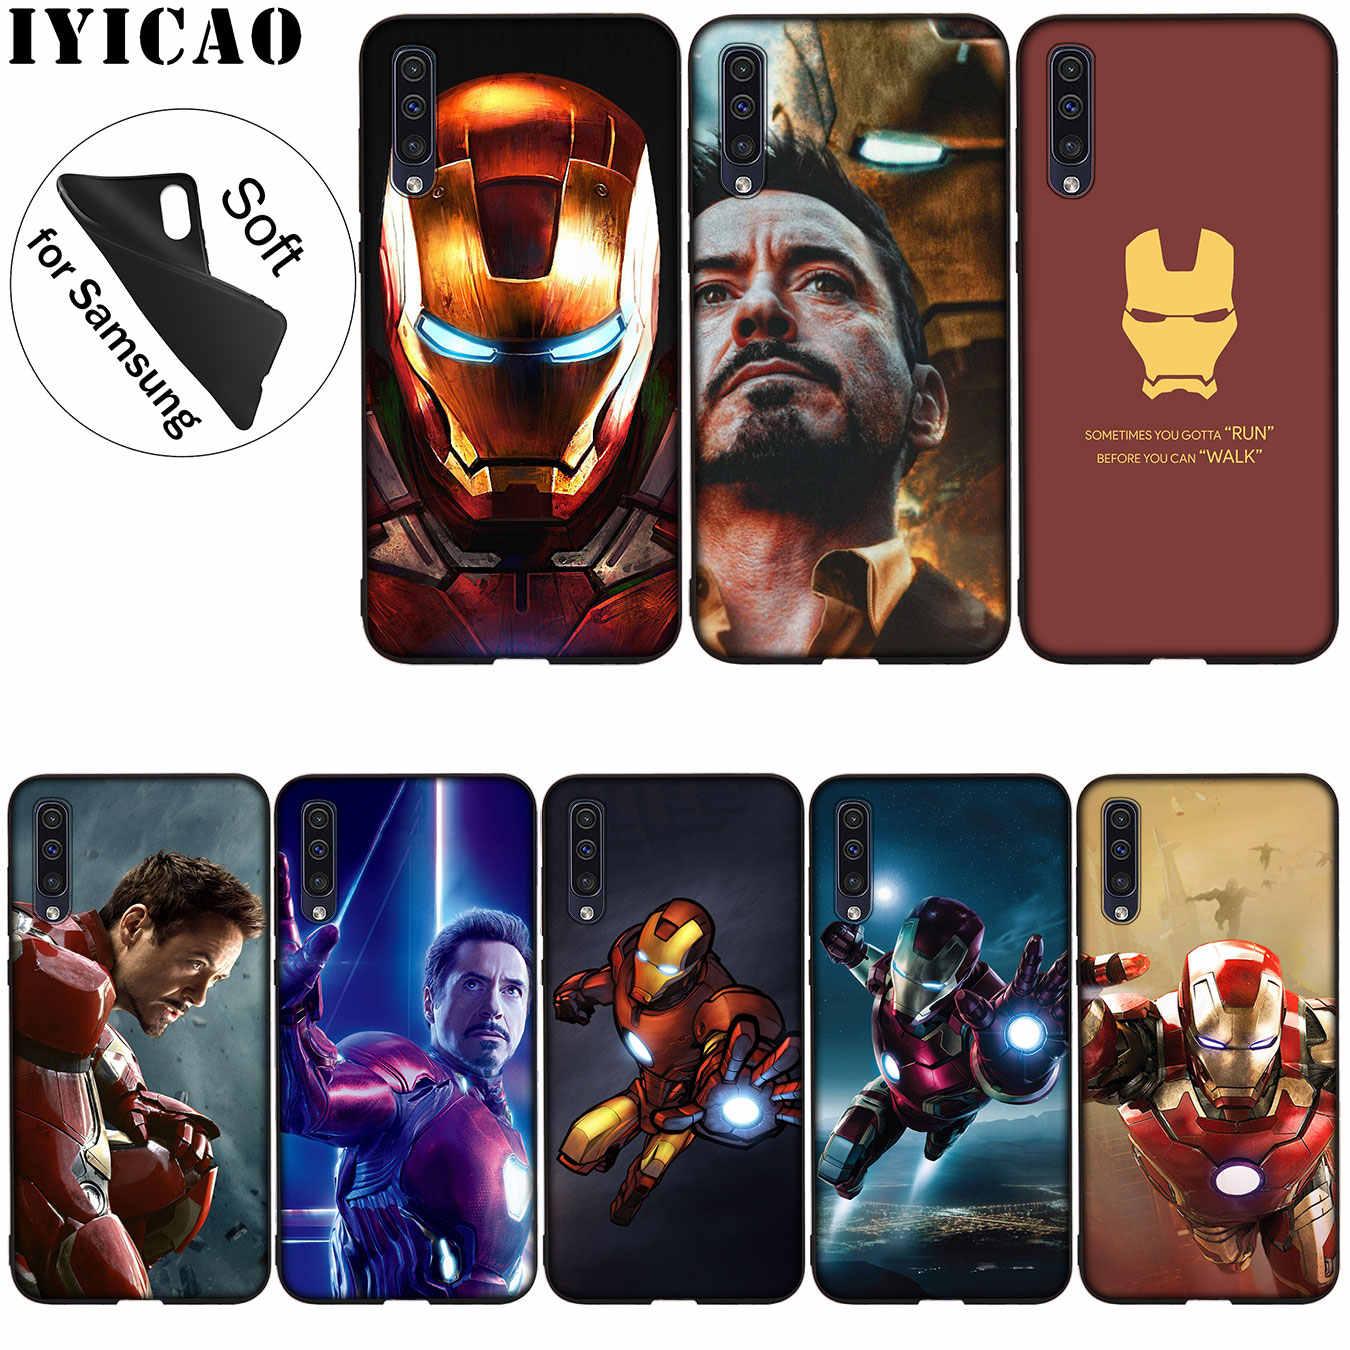 IYICAO Iron Man Marvel Silicone Mềm dành cho Samsung Galaxy Samsung Galaxy Note 9 8 10 Plus M10 M20 M30 M40 10 + Tặng Bao Da